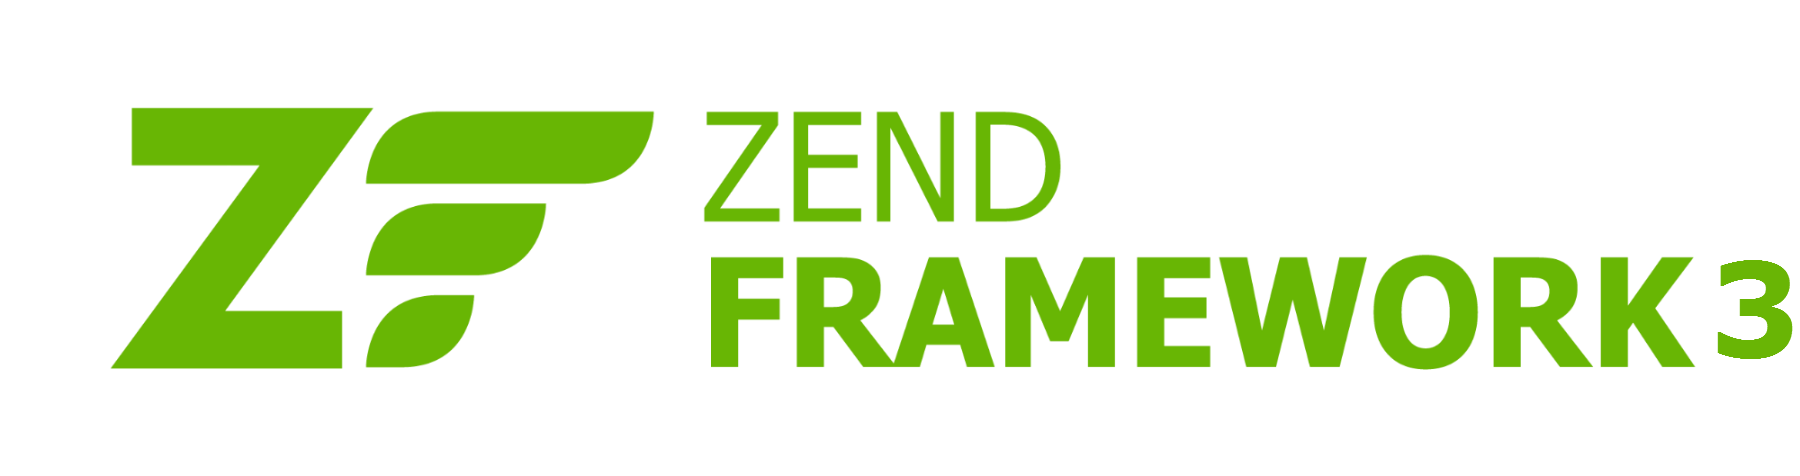 Zend Framework 3: PHP 7